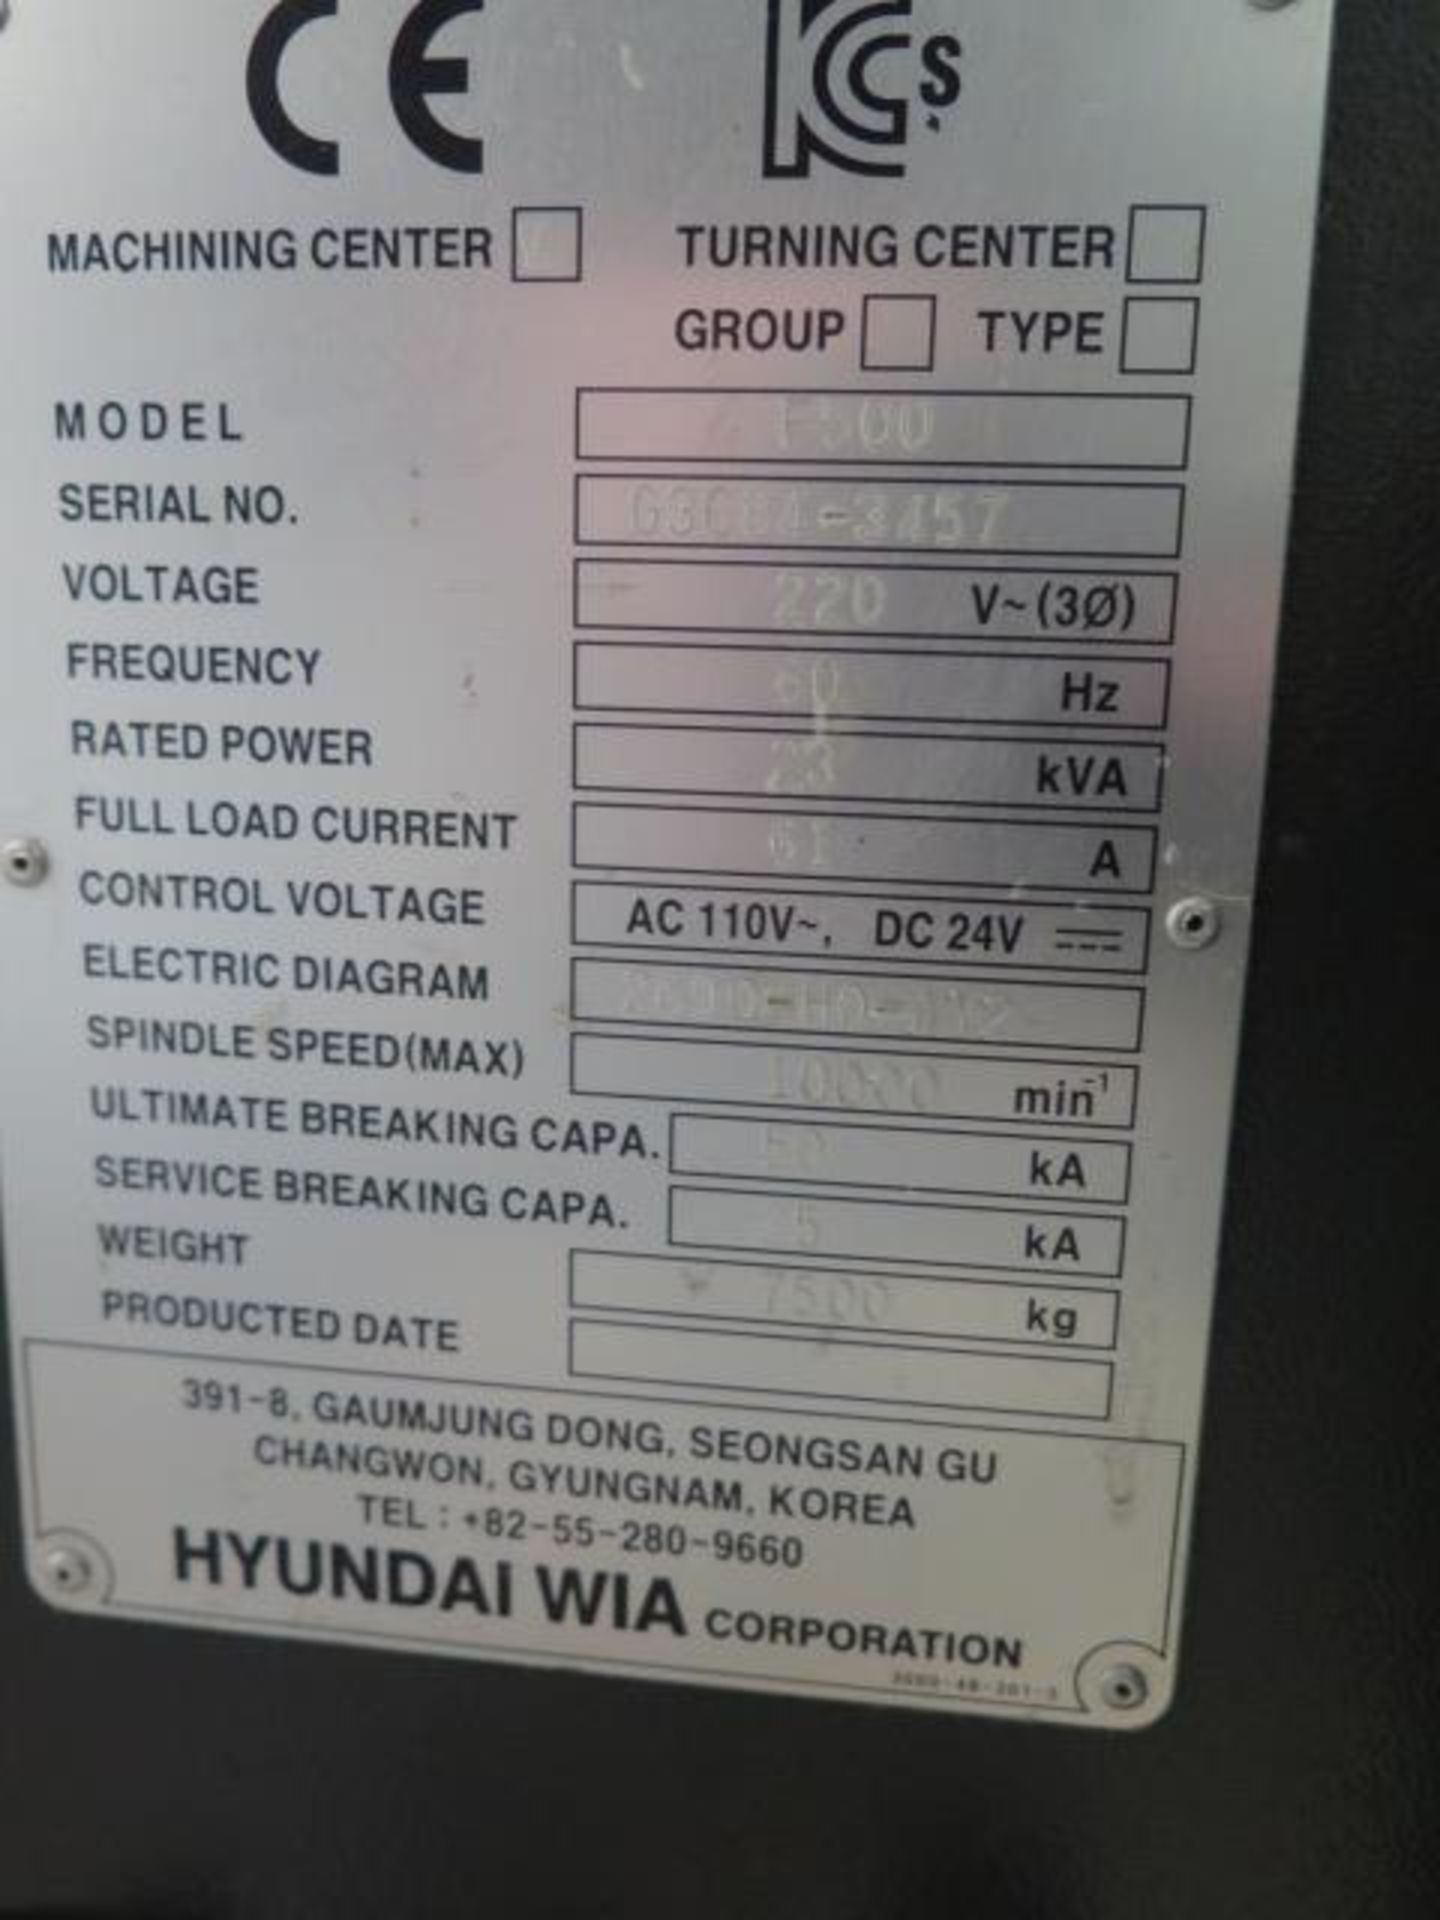 2016 Hyundai WIA F500 4-Axis CNC VMC s/n G3684-3457 w/ Hyundai WIA Fanuc i- Series, SOLD AS IS - Image 22 of 22